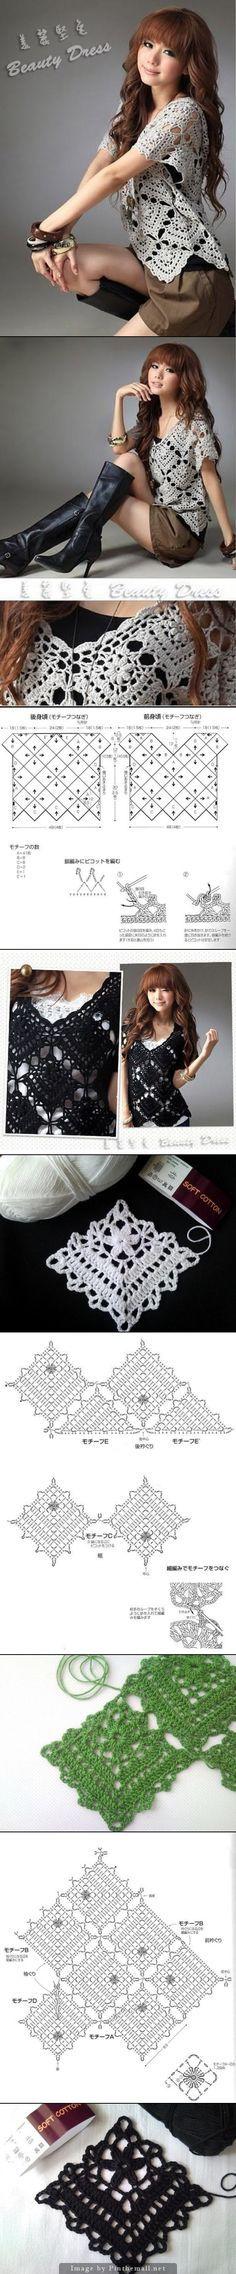 Captivating Crochet a Bodycon Dress Top Ideas. Dazzling Crochet a Bodycon Dress Top Ideas. Crochet Bolero, Pull Crochet, Gilet Crochet, Crochet Motifs, Crochet Diagram, Crochet Squares, Crochet Cardigan, Love Crochet, Beautiful Crochet